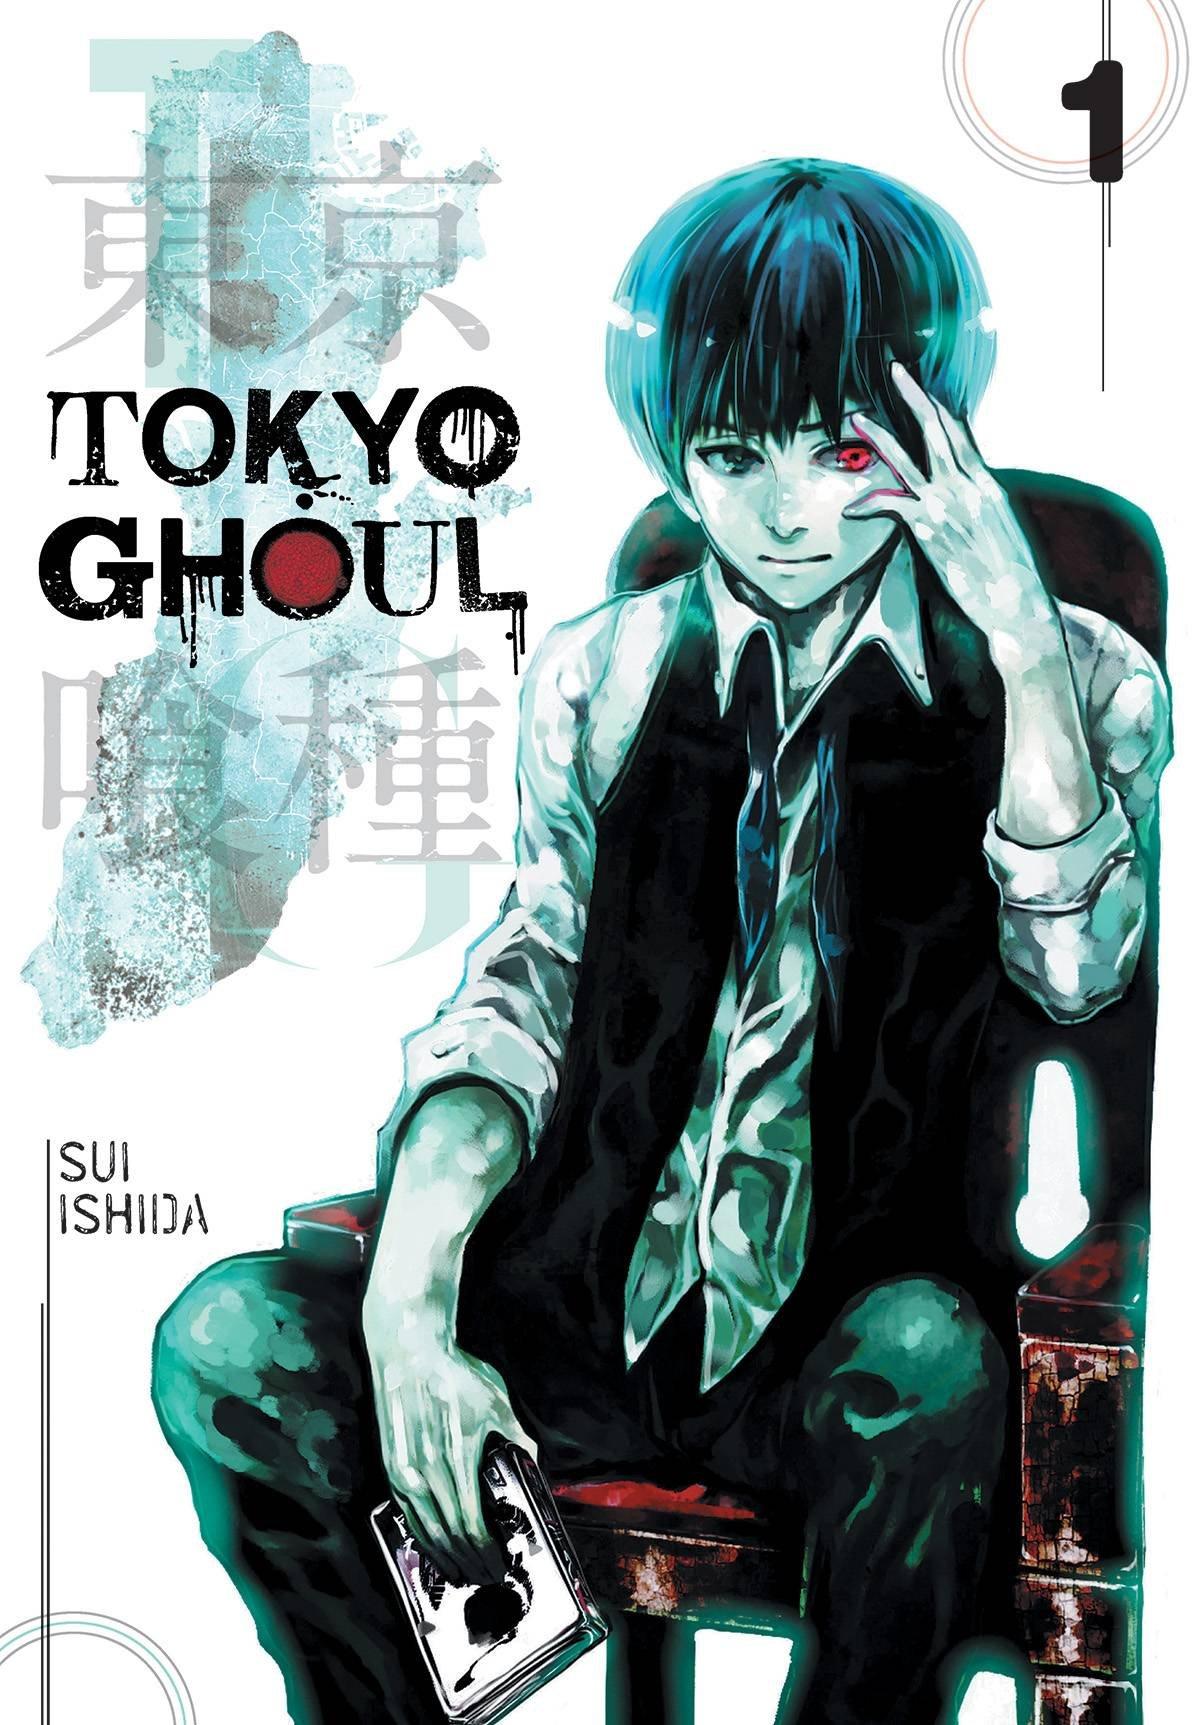 Tokyo Ghoul Vol 1 Sui Ishida 0787721859499 Amazon Books